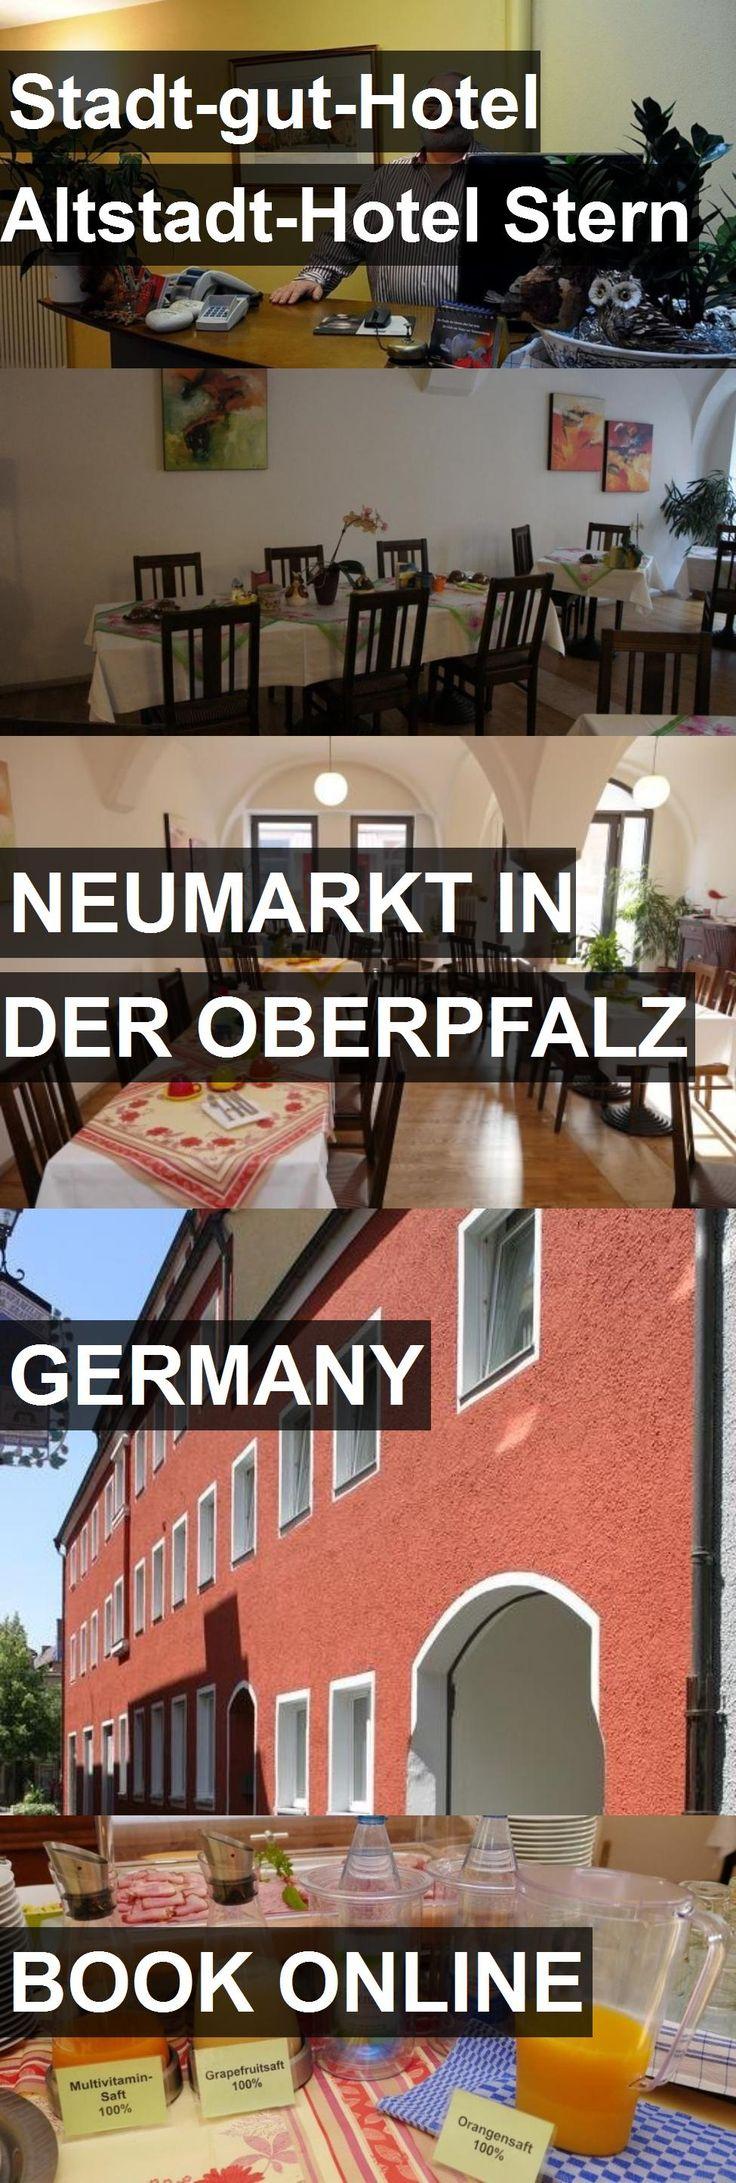 Stadt-gut-Hotel Altstadt-Hotel Stern in Neumarkt in der Oberpfalz, Germany. For more information, photos, reviews and best prices please follow the link. #Germany #NeumarktinderOberpfalz #travel #vacation #hotel